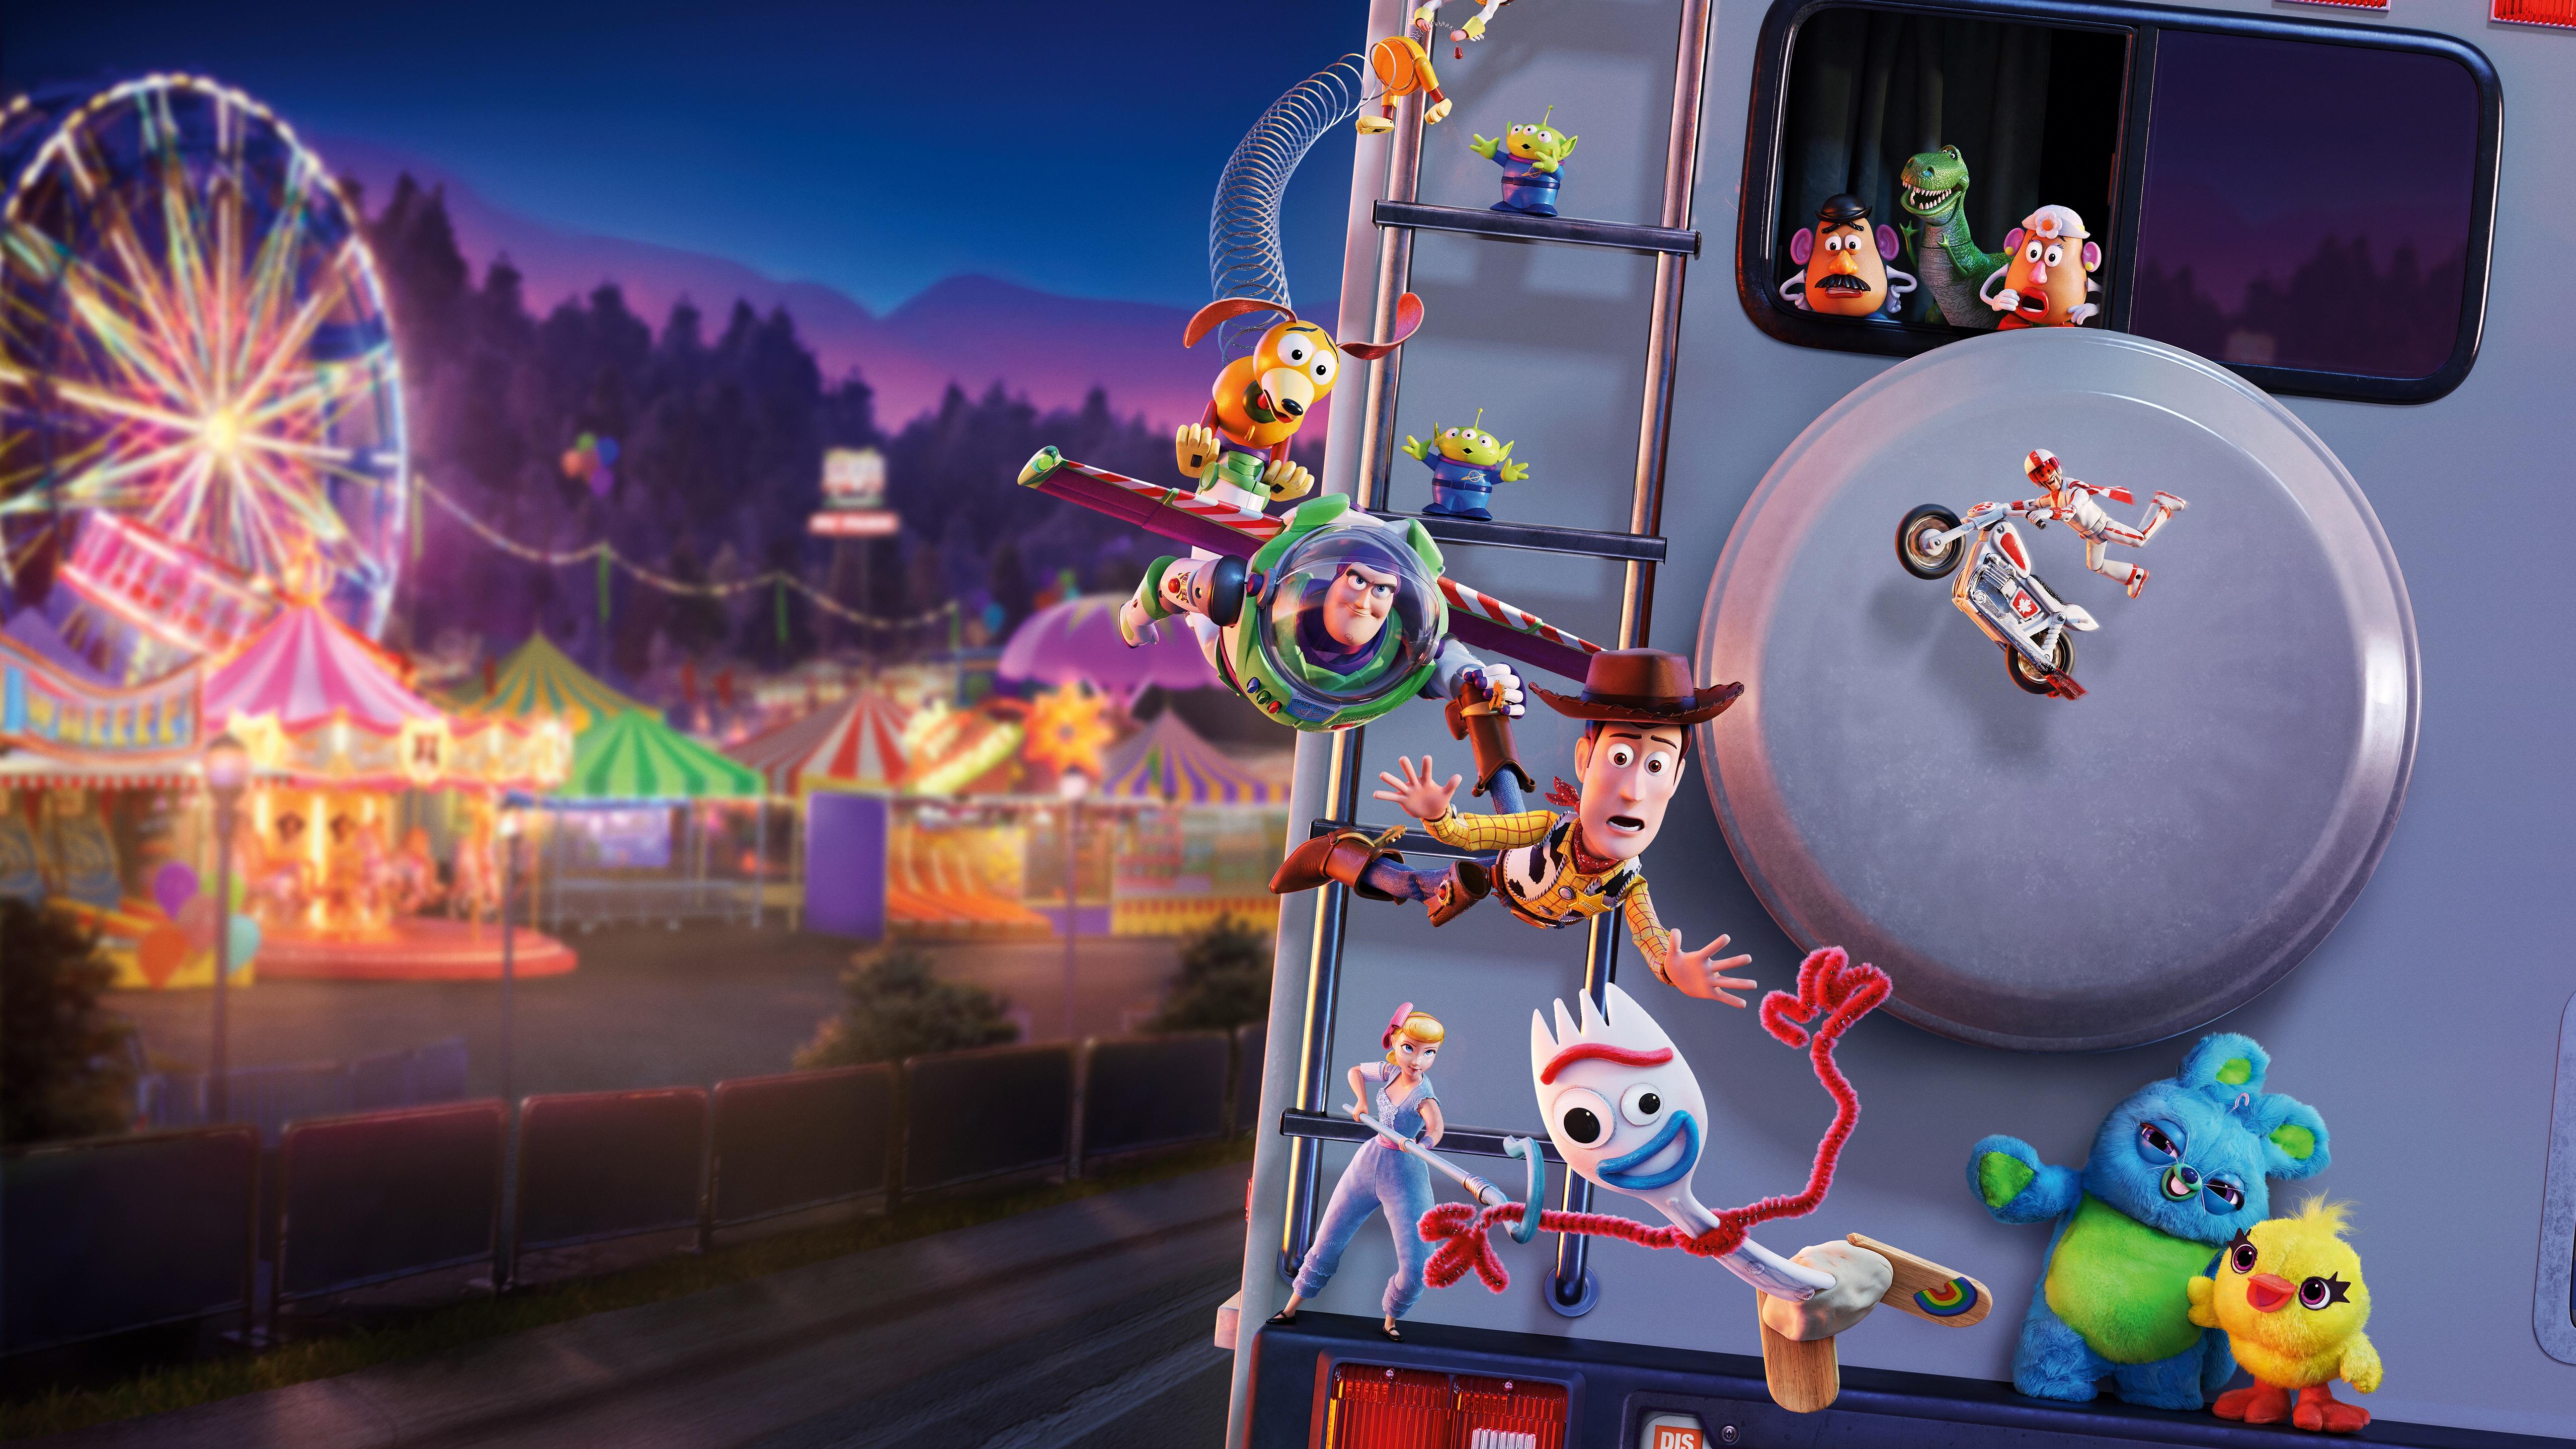 Toy Story 4 5k Retina Ultra HD Wallpaper Background Image 5120x2880